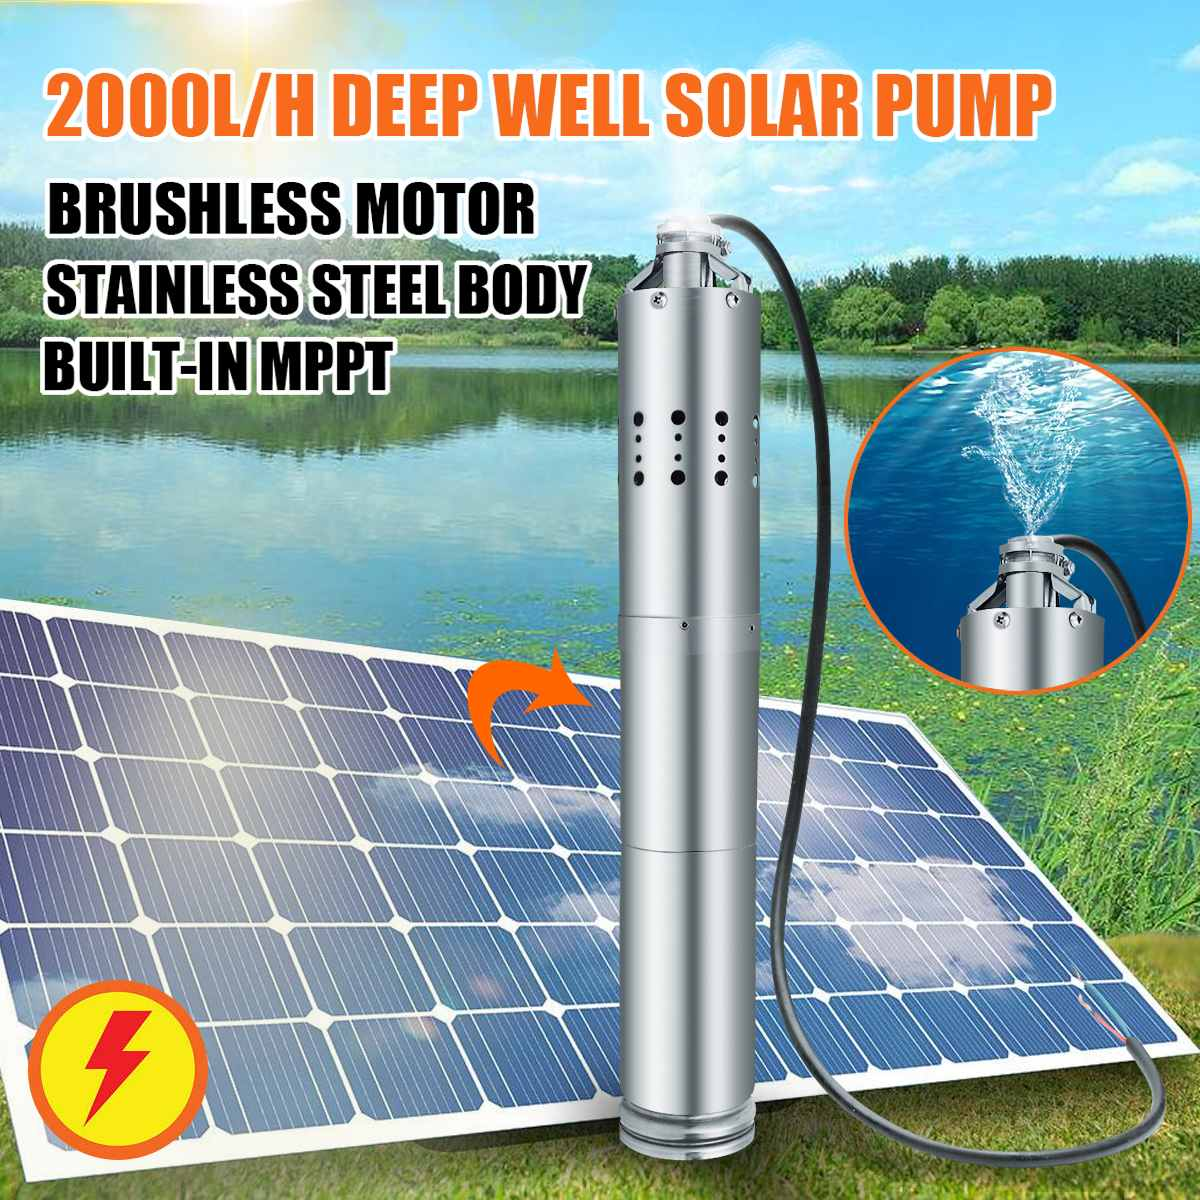 Solar Powered Water Pump 24V 2000L/H 40m Deep Well Pump DC Submersible Pump Bore Hole Deep Garden Home Agricultural Farm Ranch